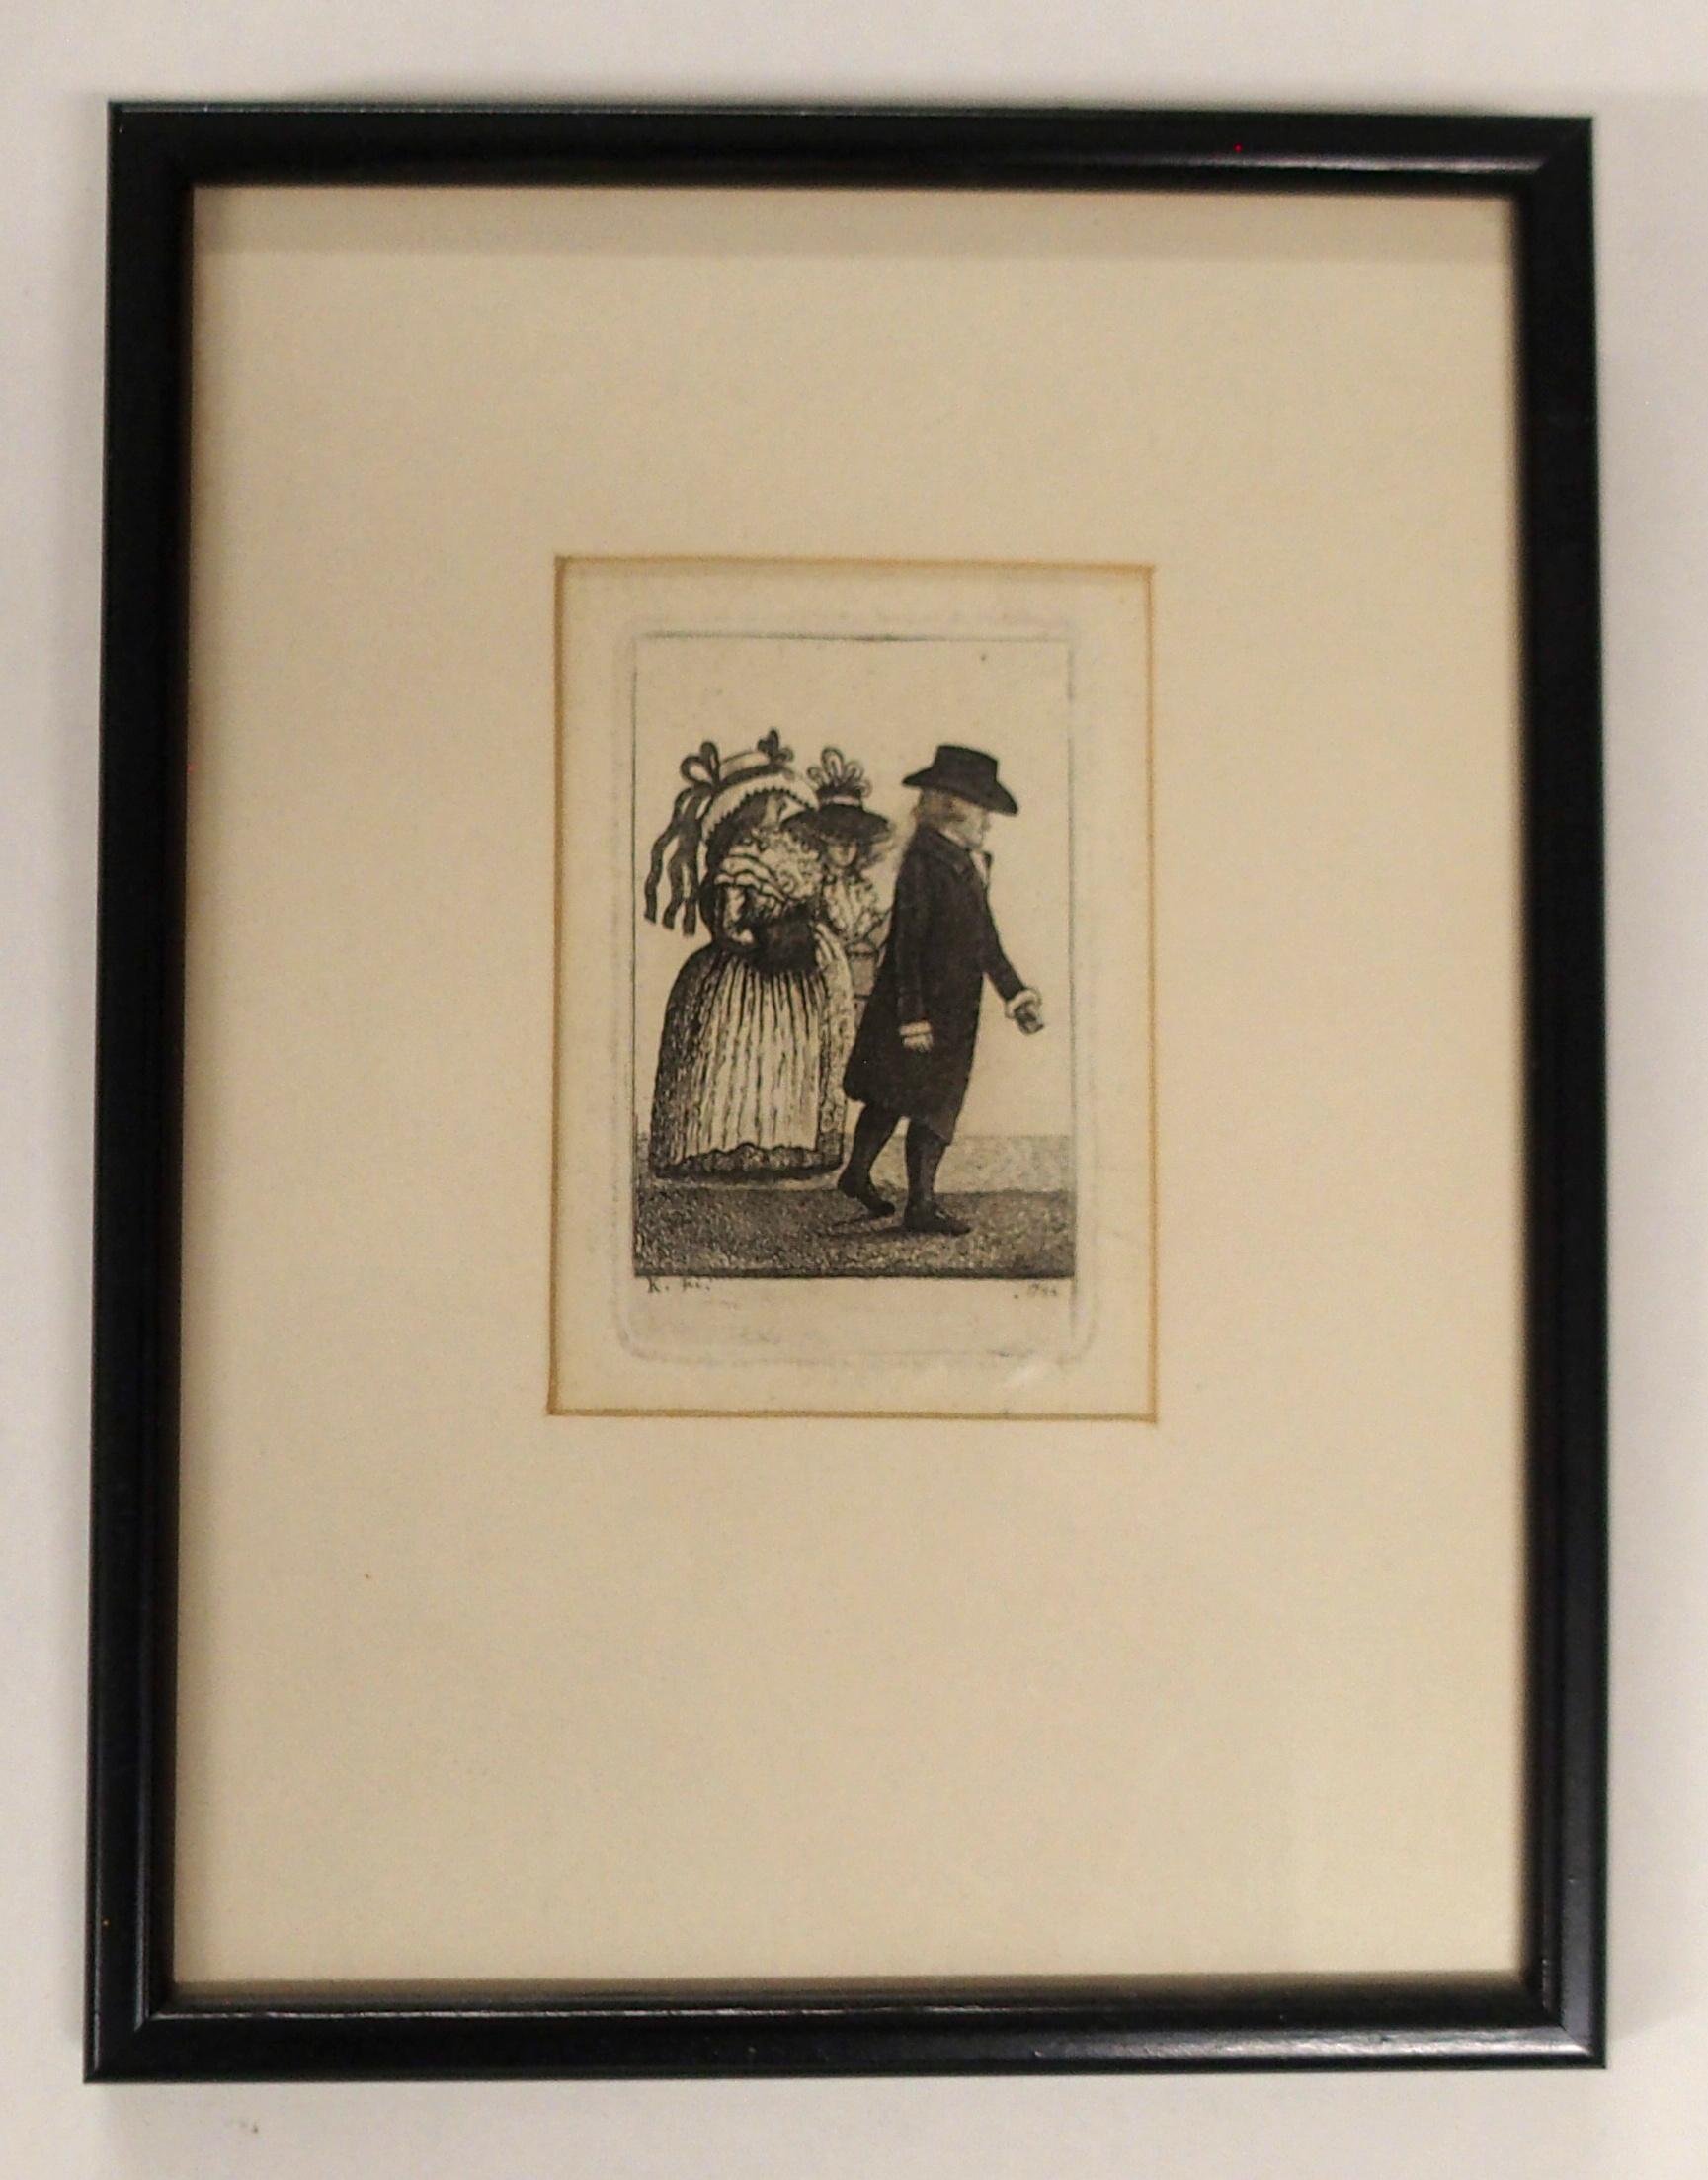 AFTER JOHN DUNCAN THE HEADLESS HORSEMAN engraving, 12 x 8cm, Admiral Viscount Duncan print, three - Image 5 of 12